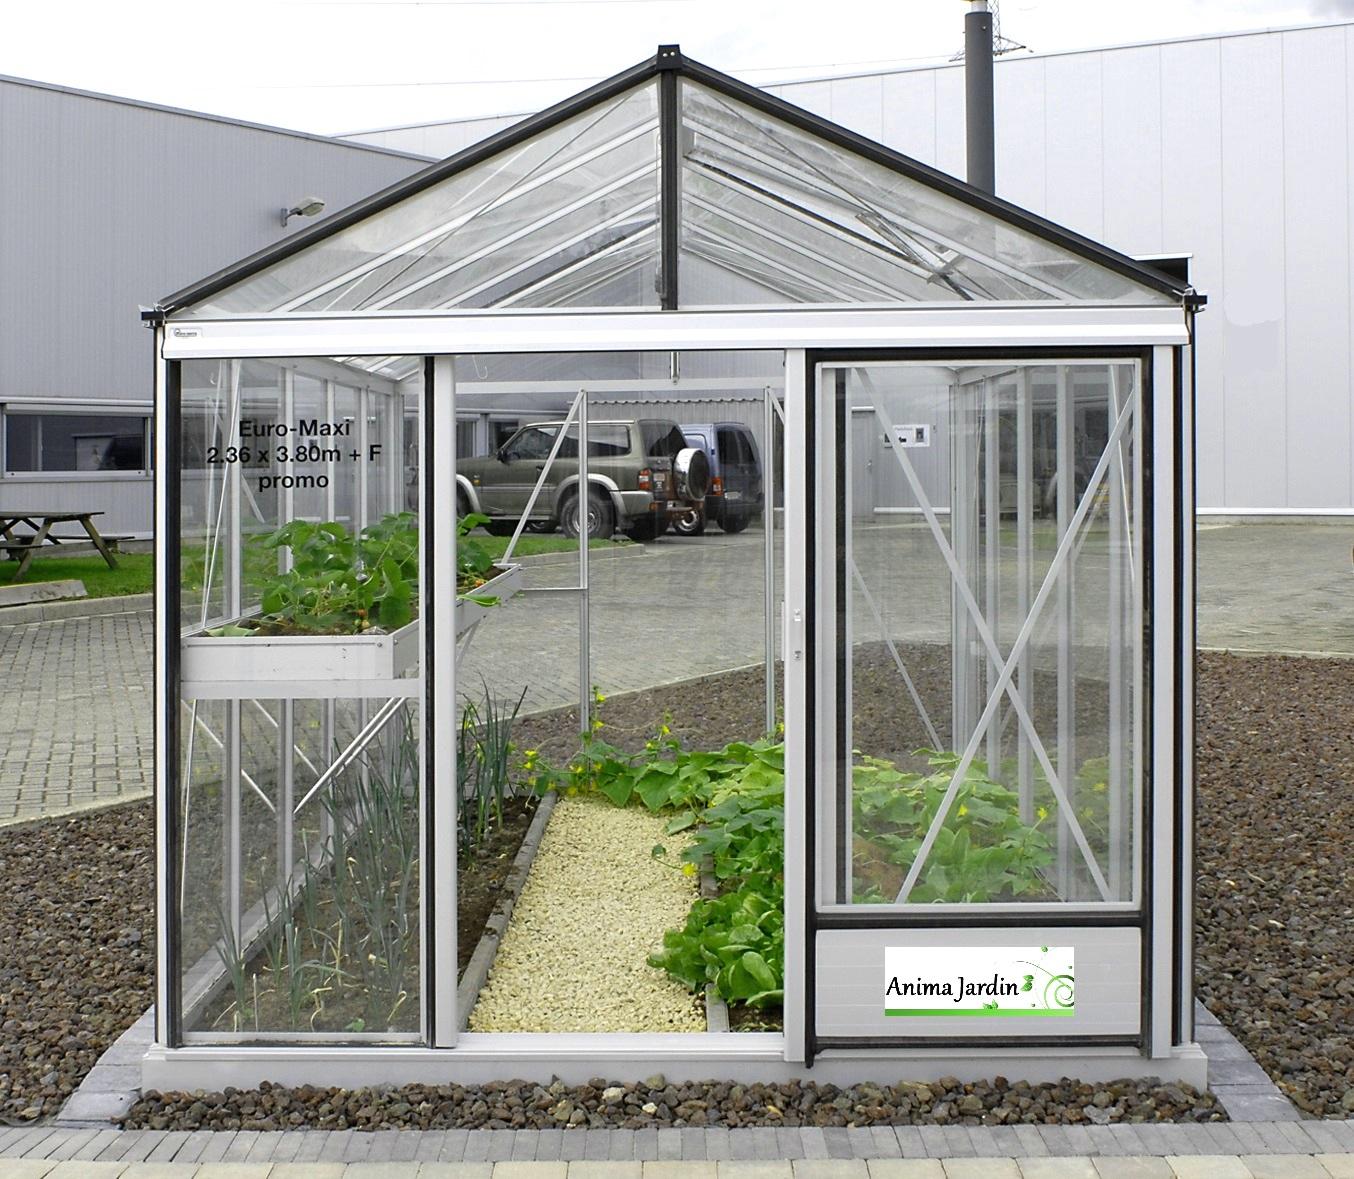 Serre Jardin Horticole, 7.30 M2, En Verre Trempé, Aluminium, Serre Euro  Maxi, Achat avec Promo Serre De Jardin En Verre